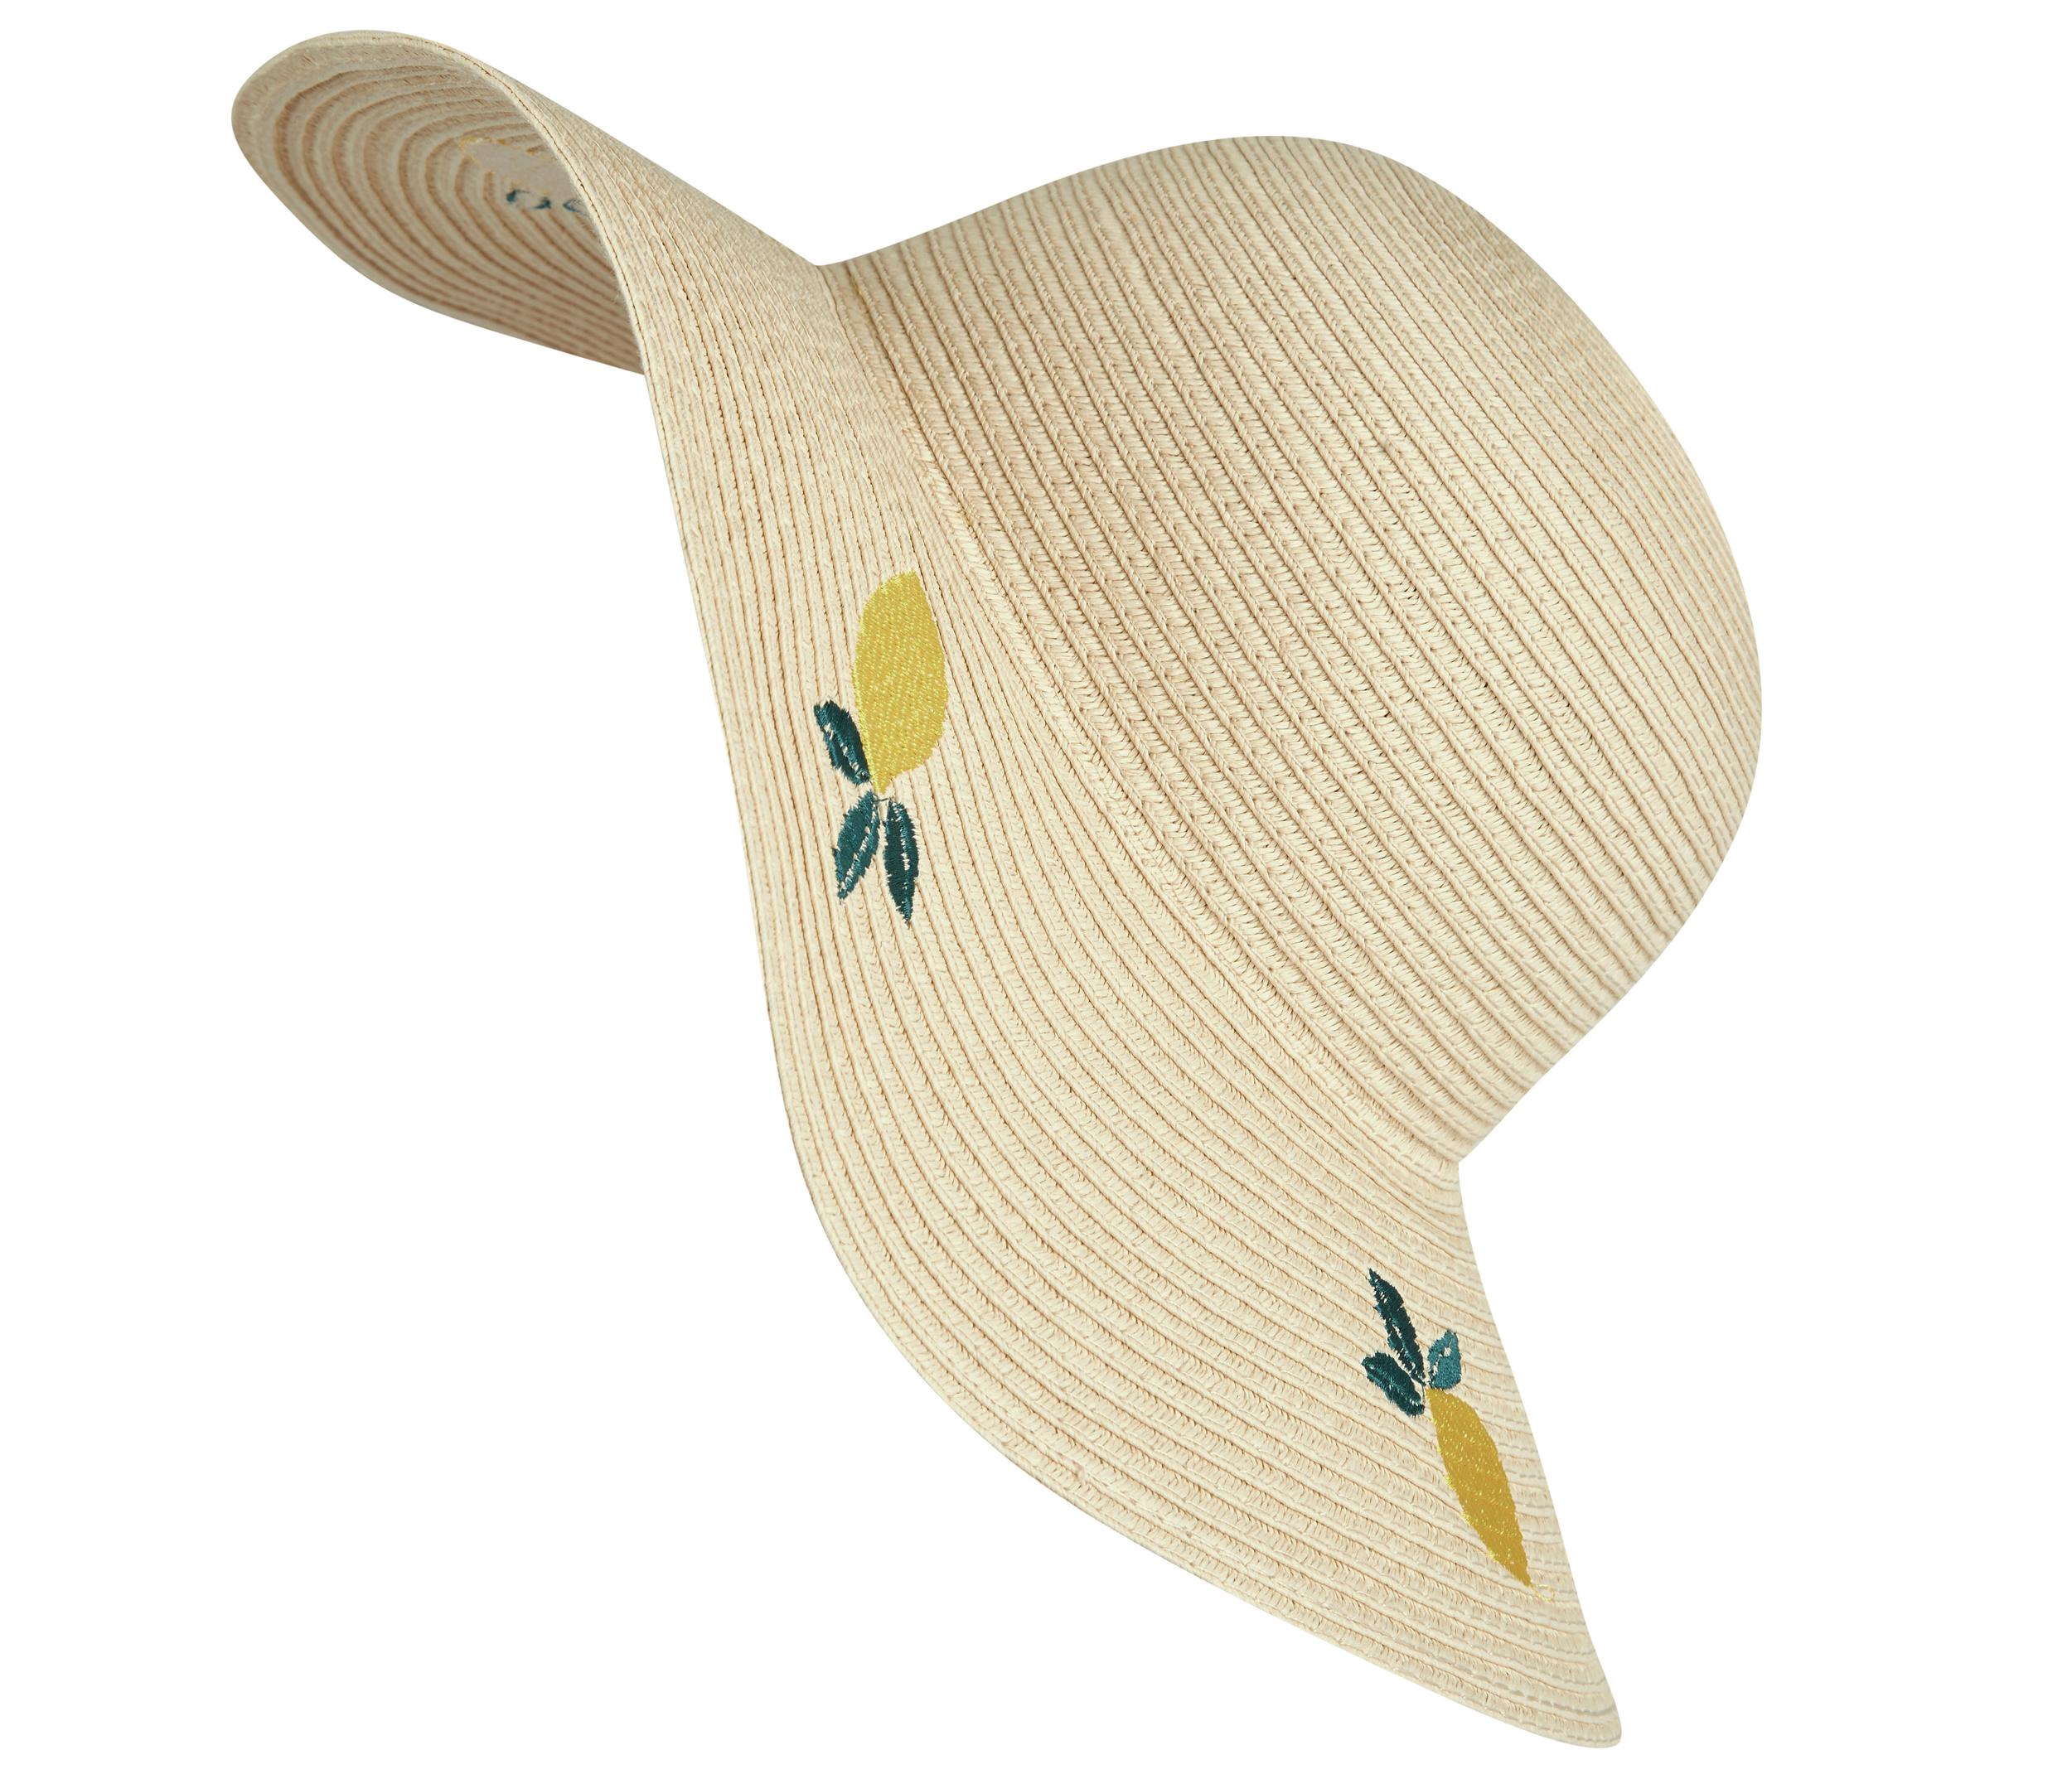 Laura Ashley Natural Lemon Embroidered Straw Floppy Hat